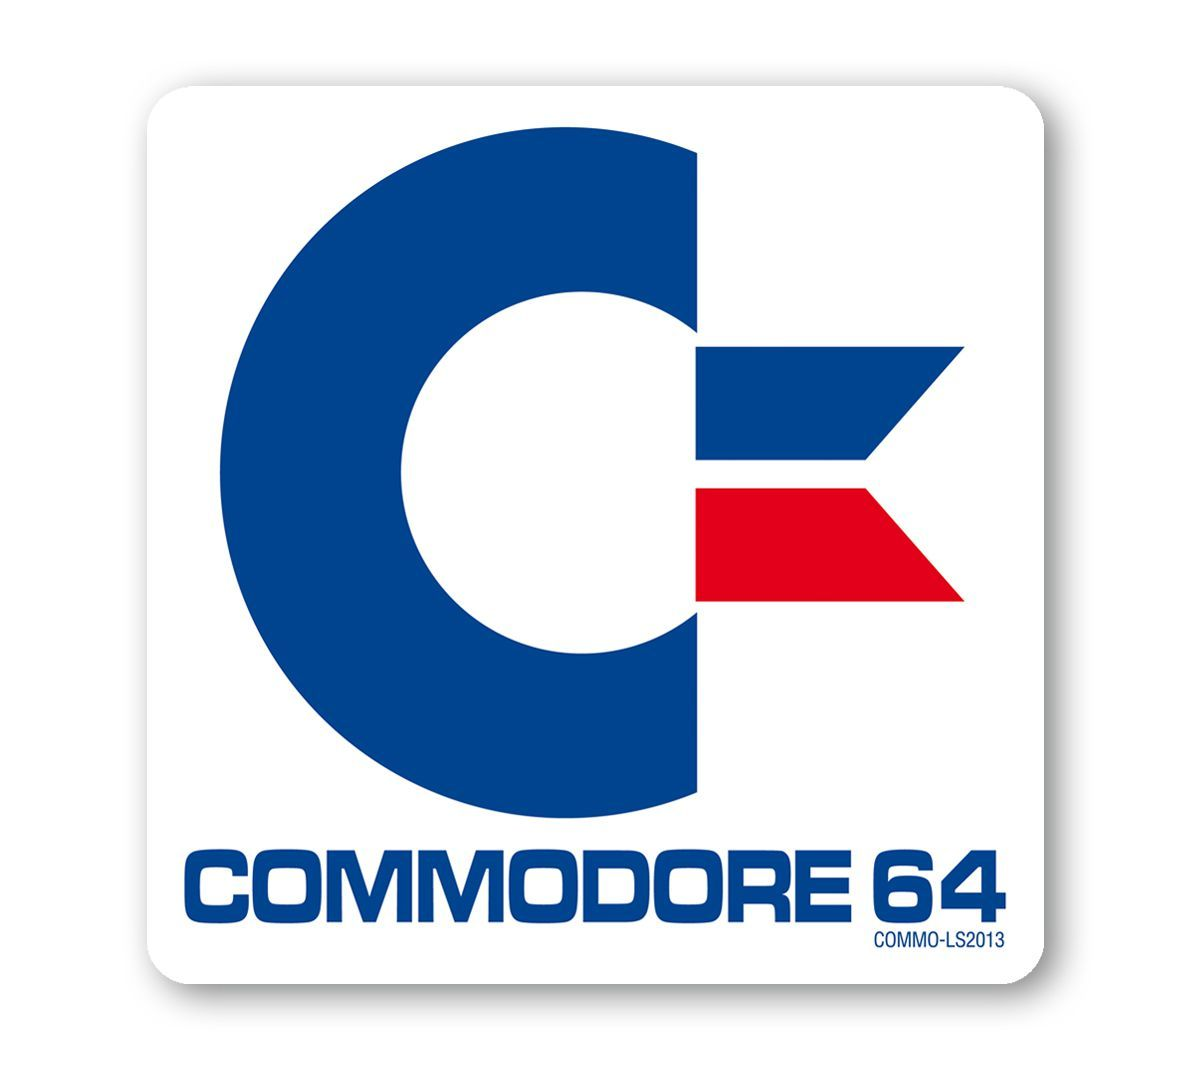 commodore 64 logo wwwpixsharkcom images galleries